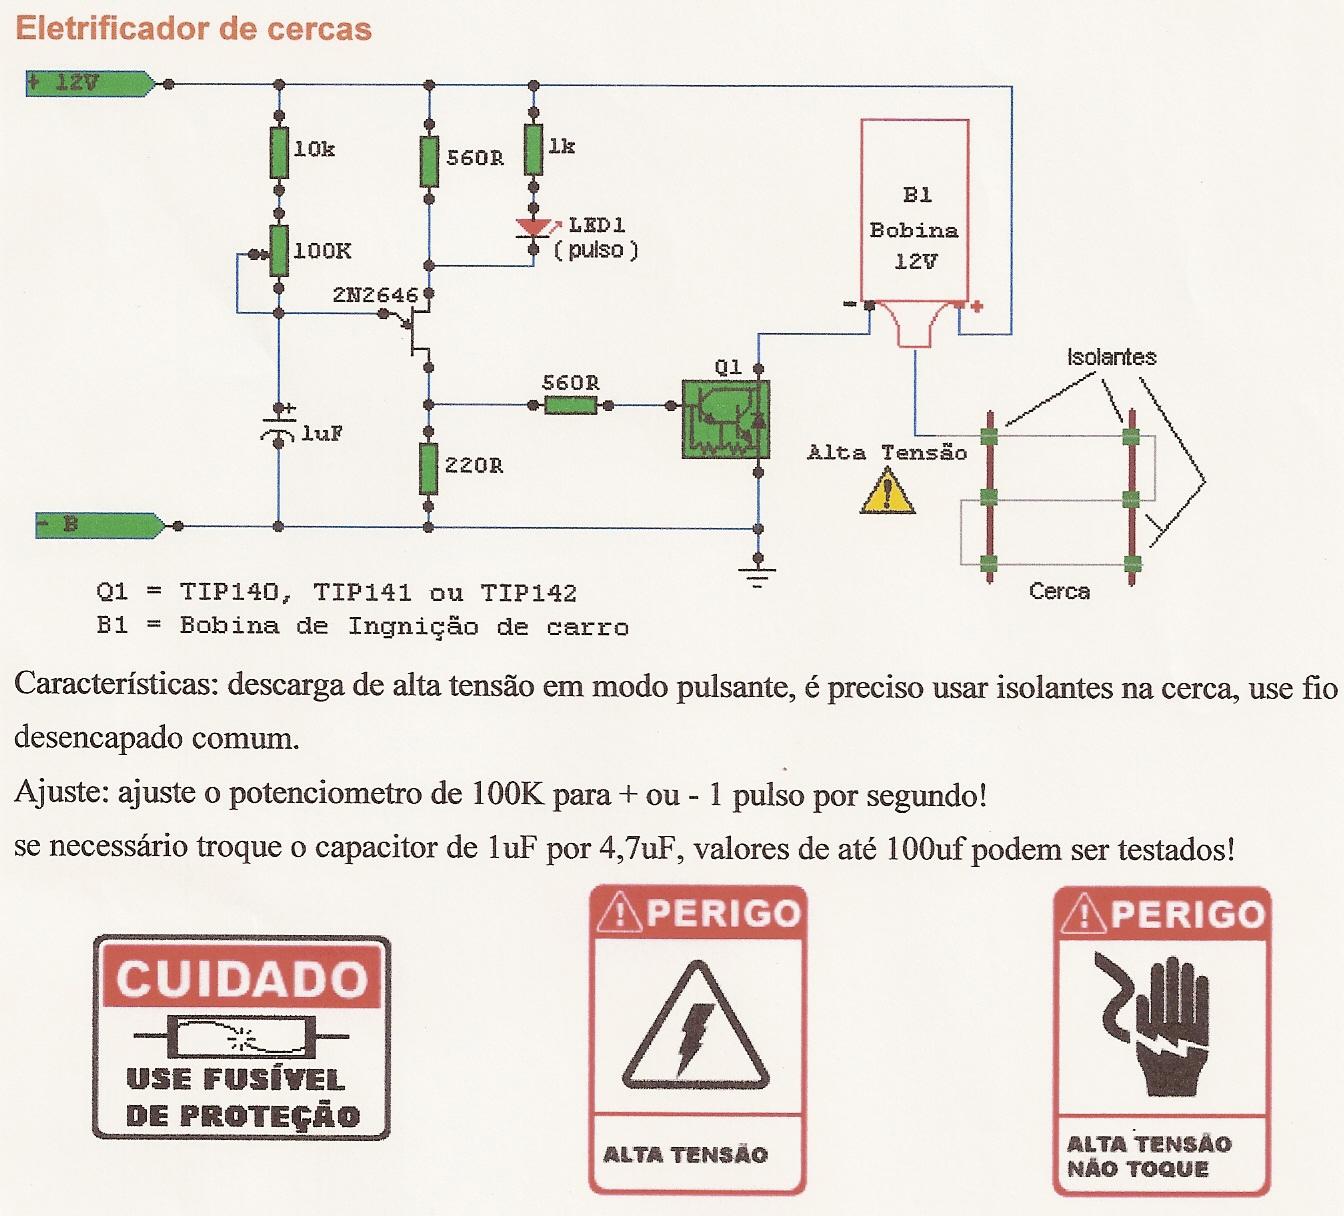 eletrificador_de_cerca_3.jpg